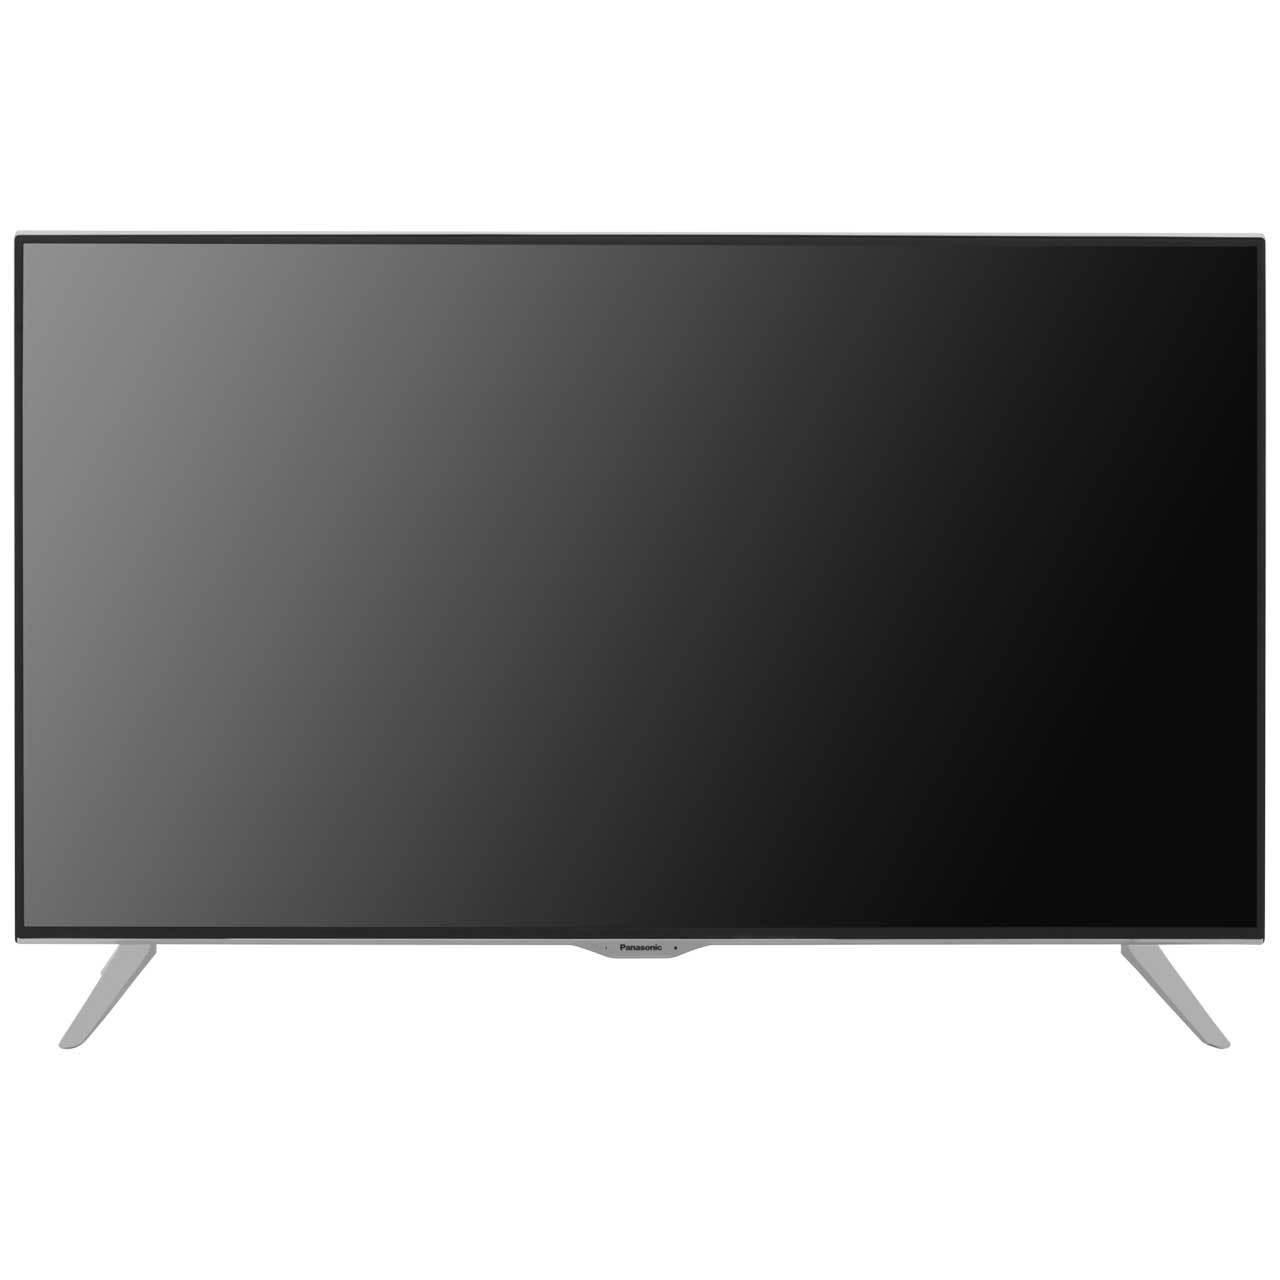 panasonic tx 48cx400b 48 inch 3d smart 4k ultra hd led tv. Black Bedroom Furniture Sets. Home Design Ideas